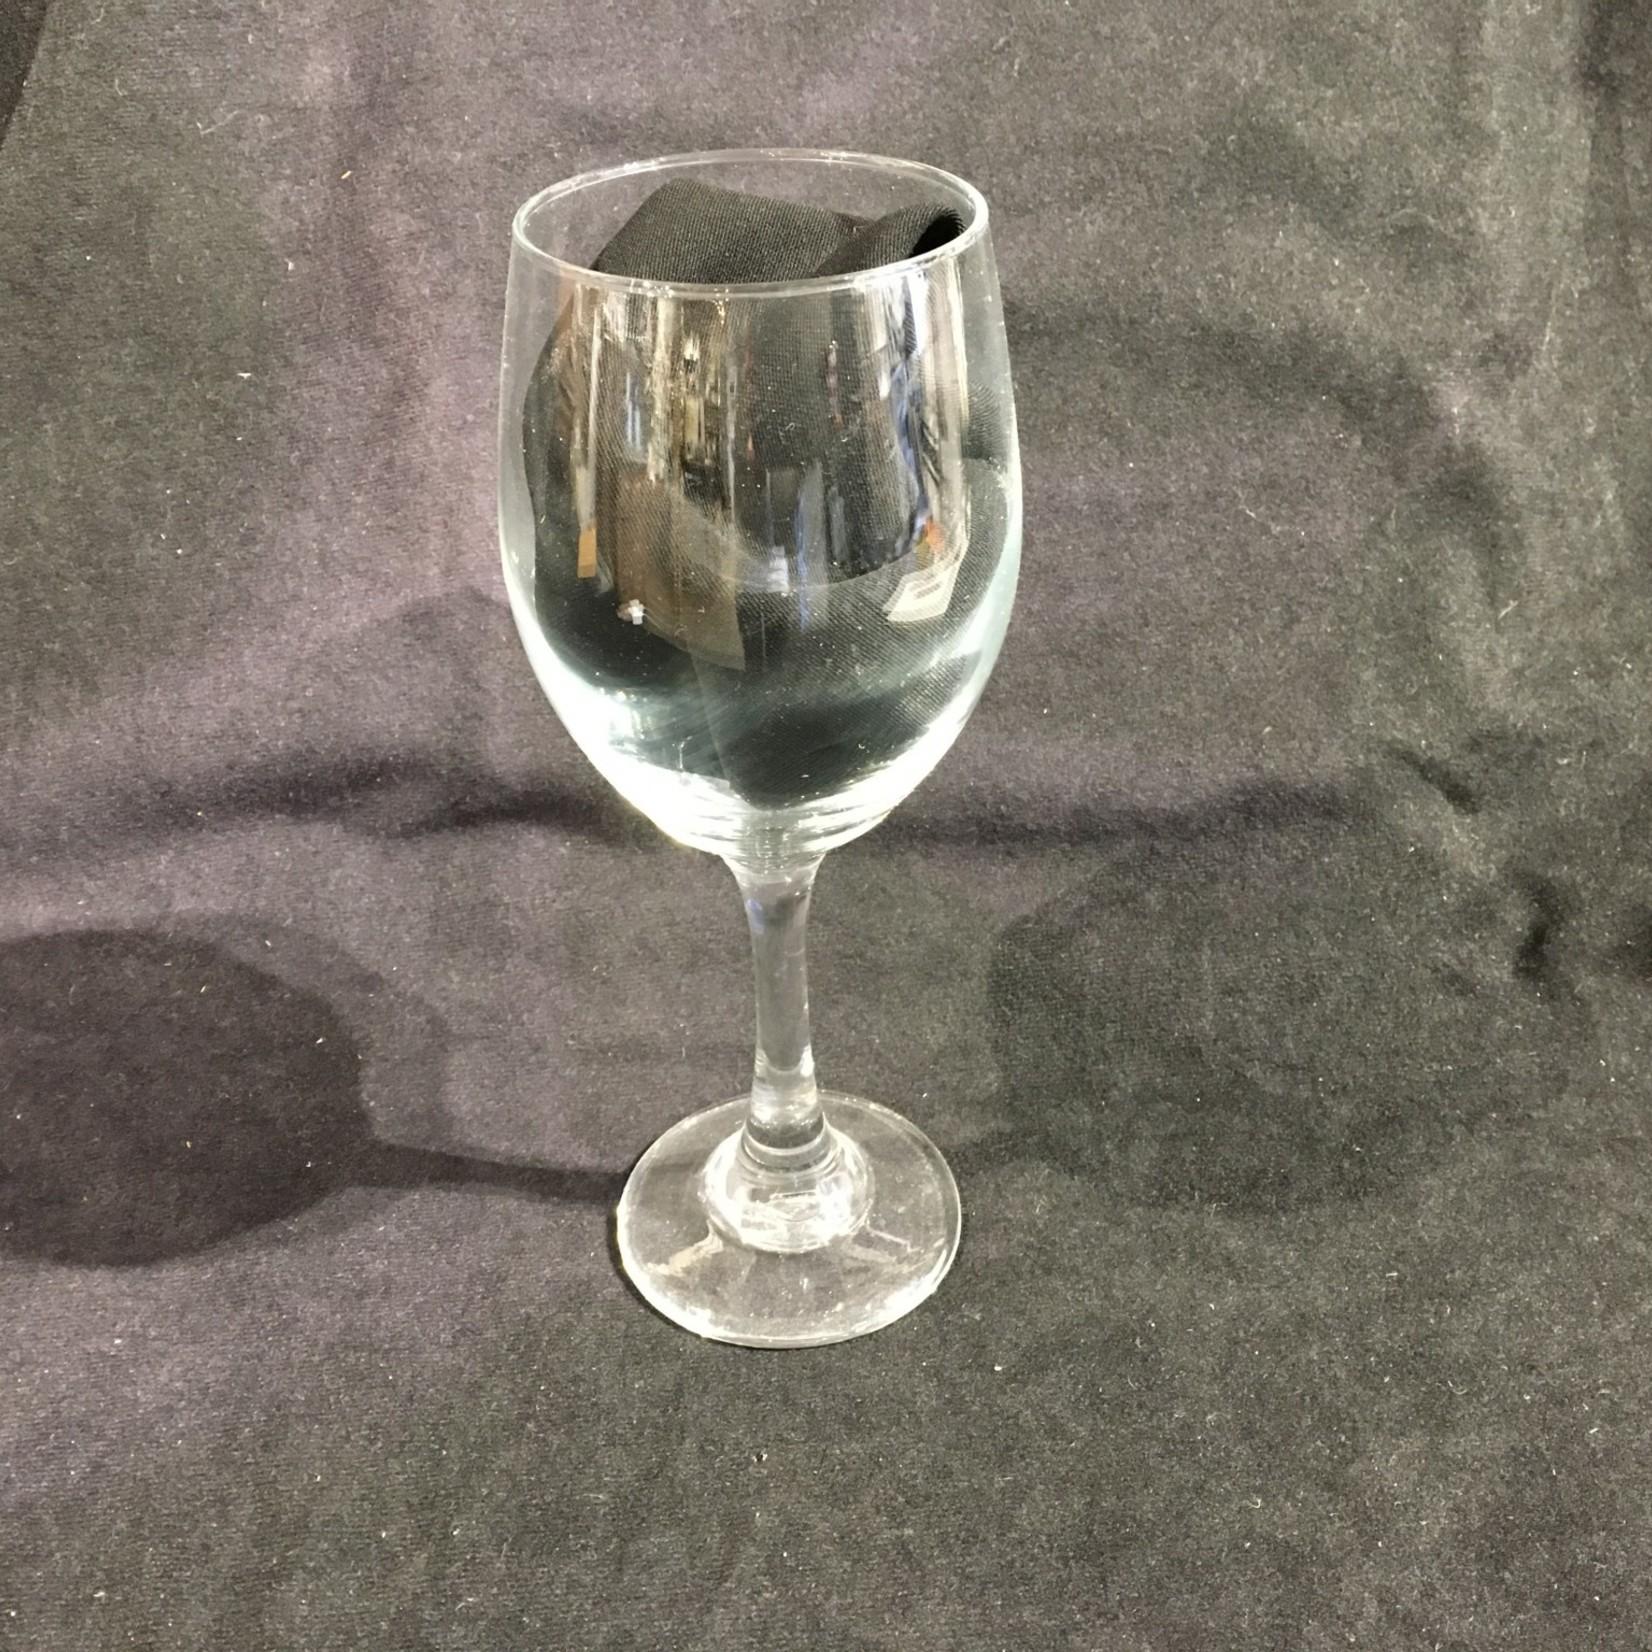 Small Wine Glass - Stemmed 14 oz